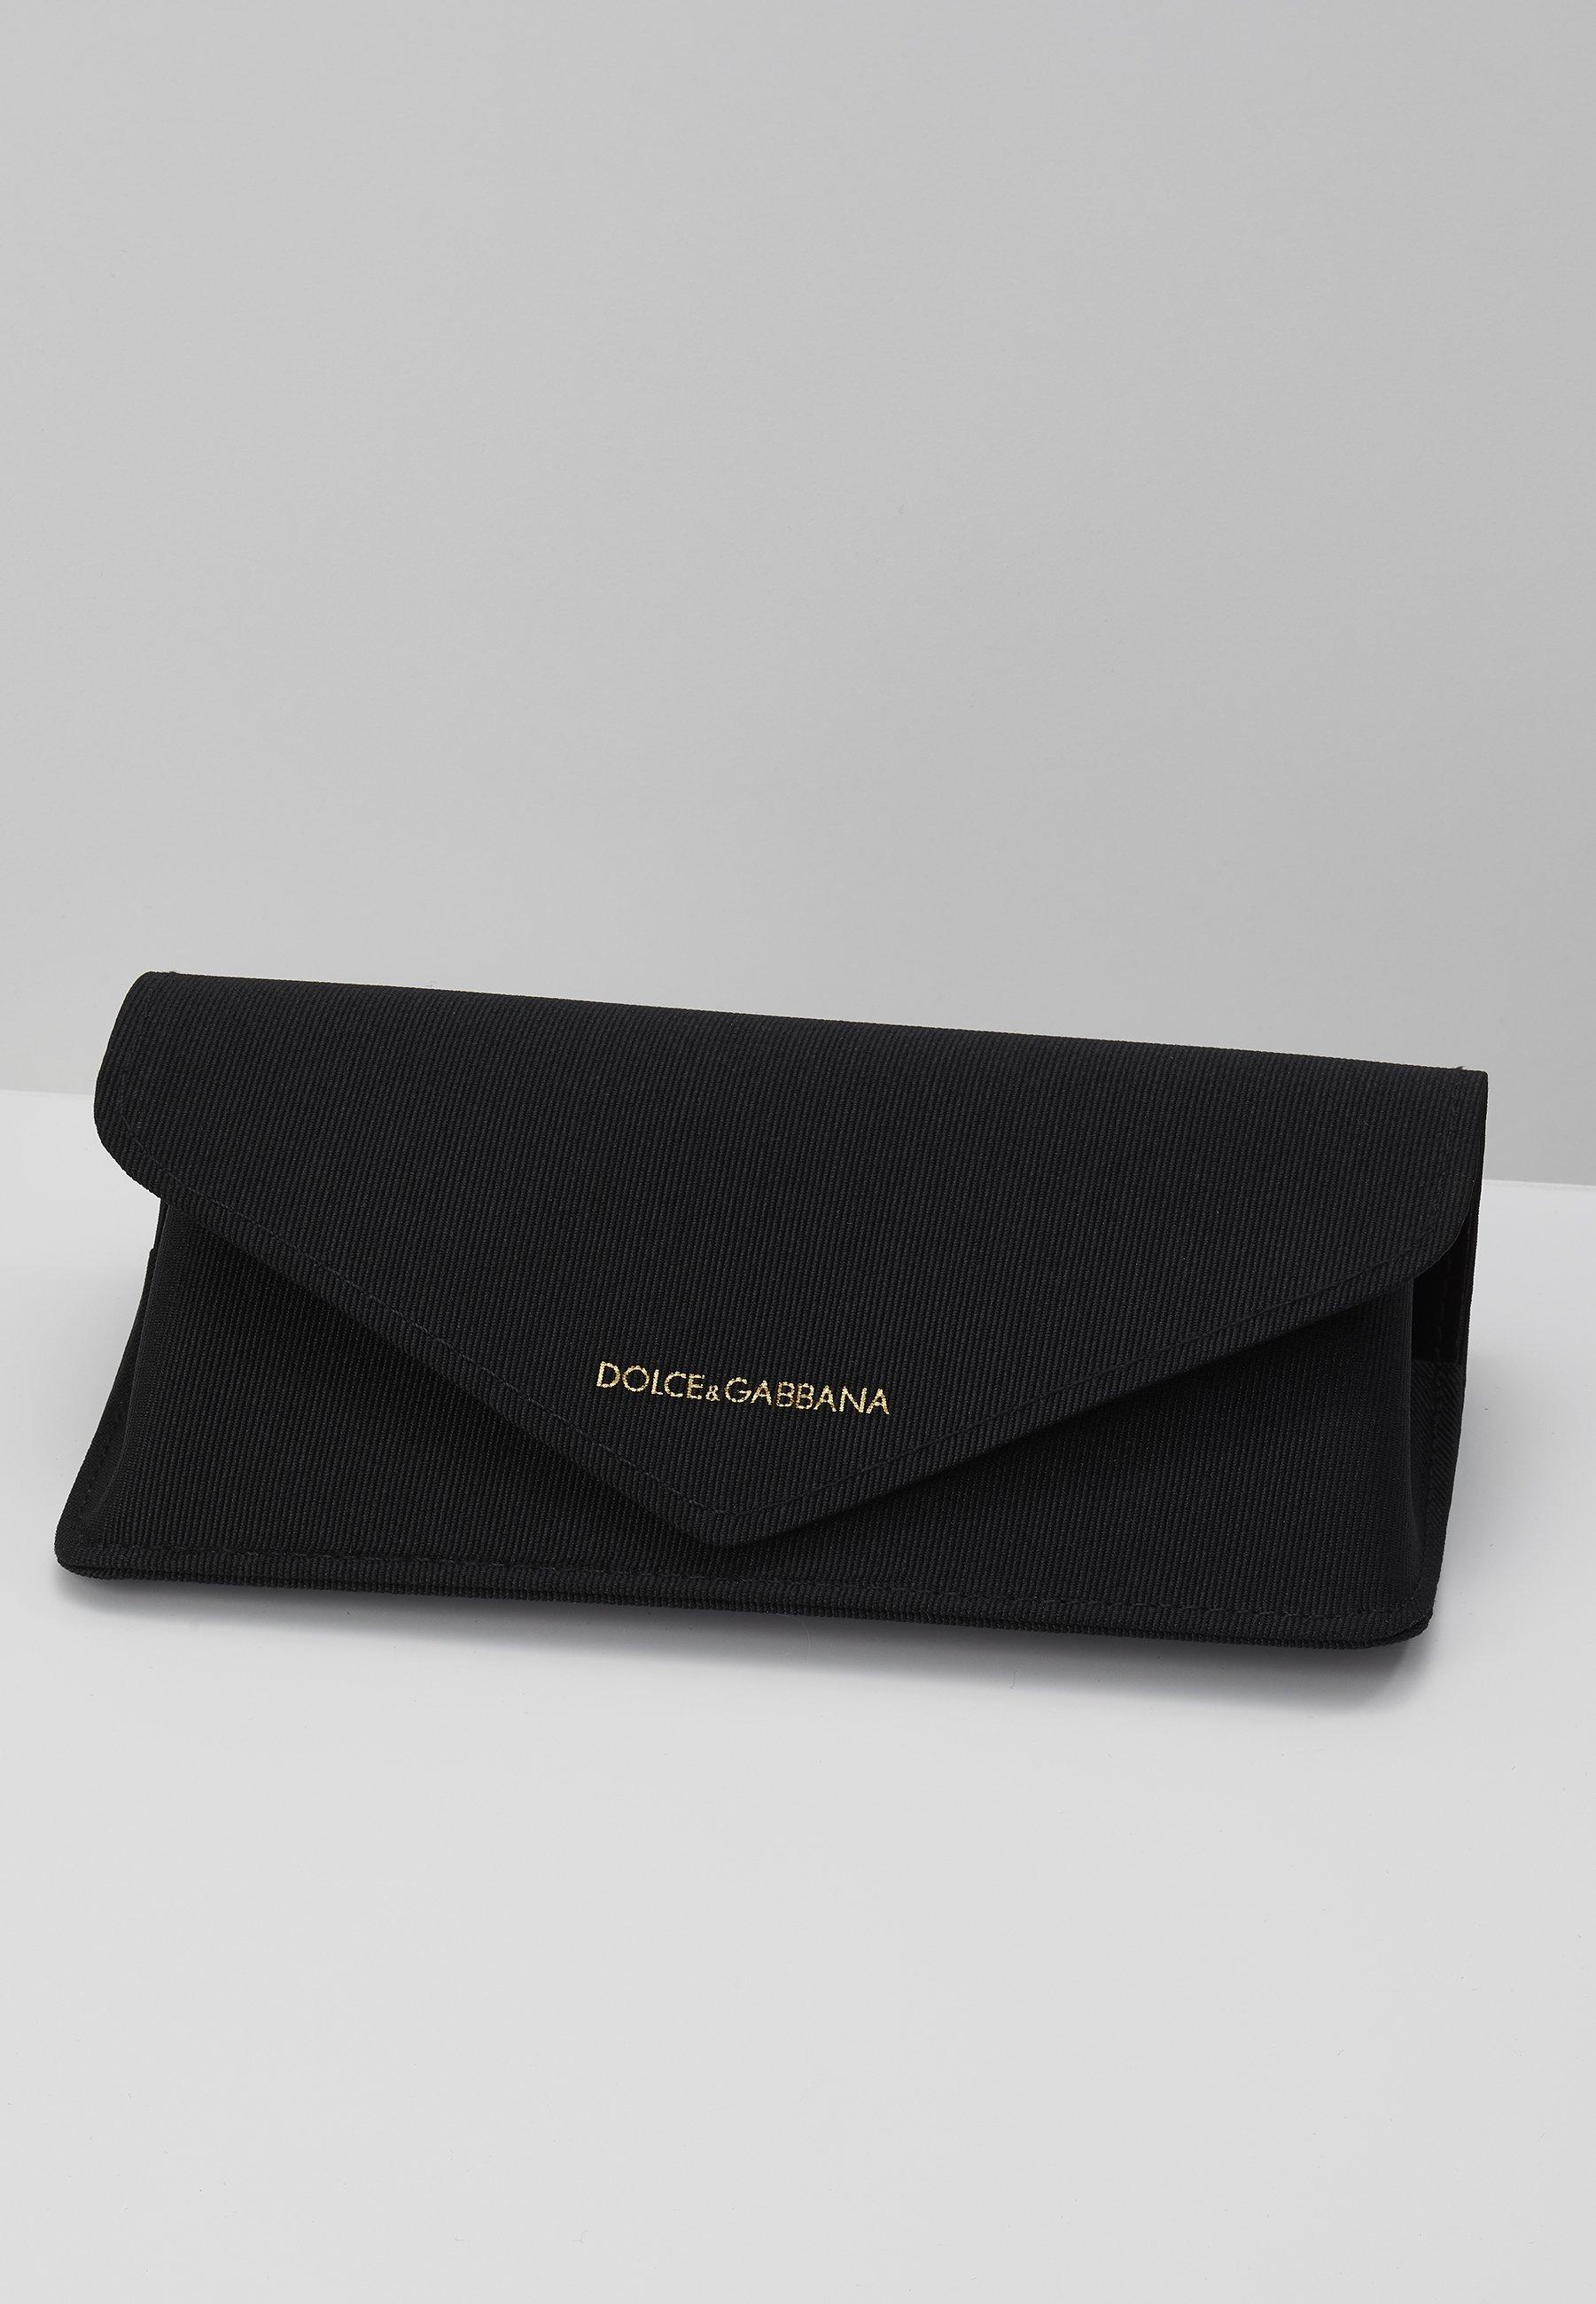 Fashion Style Fast Express Accessories Dolce&Gabbana Sunglasses black/gold-coloured pY1Bwj95b KHFssxa4W